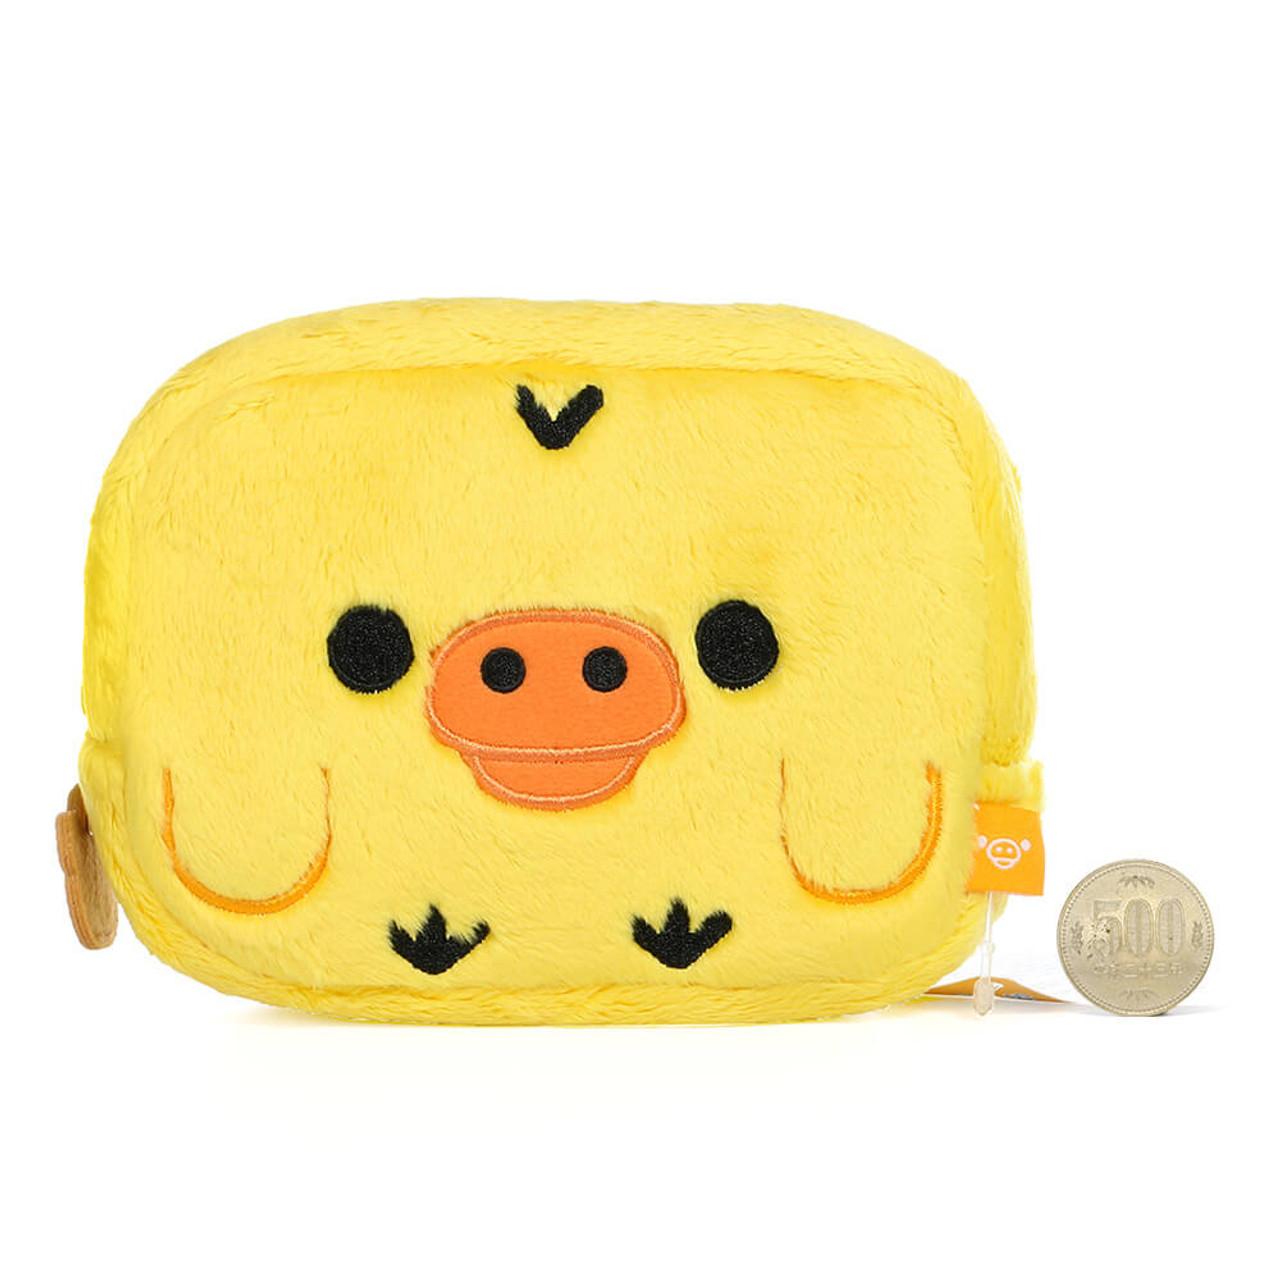 San-x Kiiroitori Yellow Chick Rectangle Face Plush Cosmetic Pouch ( Proportion )